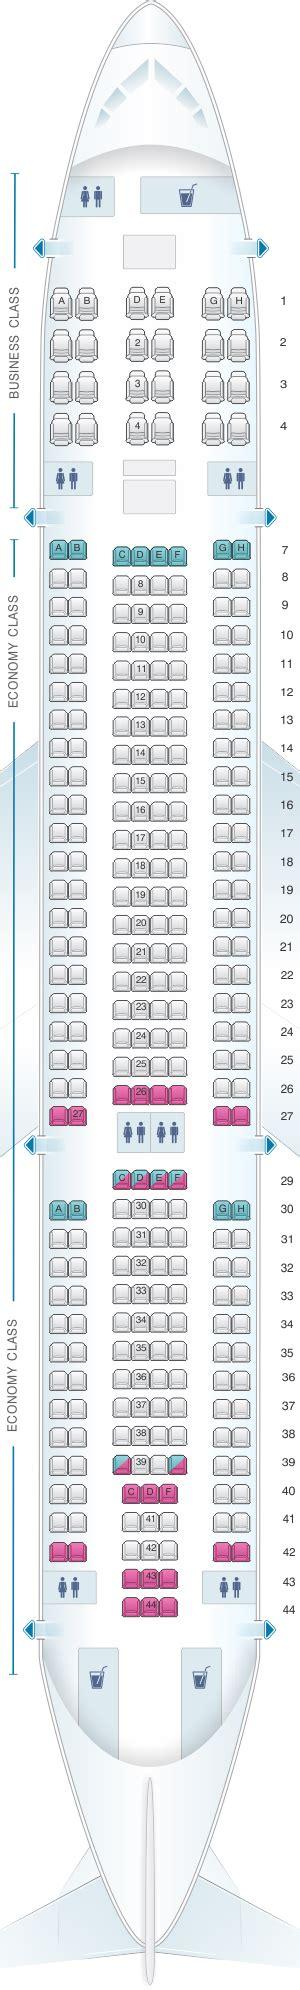 a332 seat map mapa de asientos air europa airbus a330 200 plano